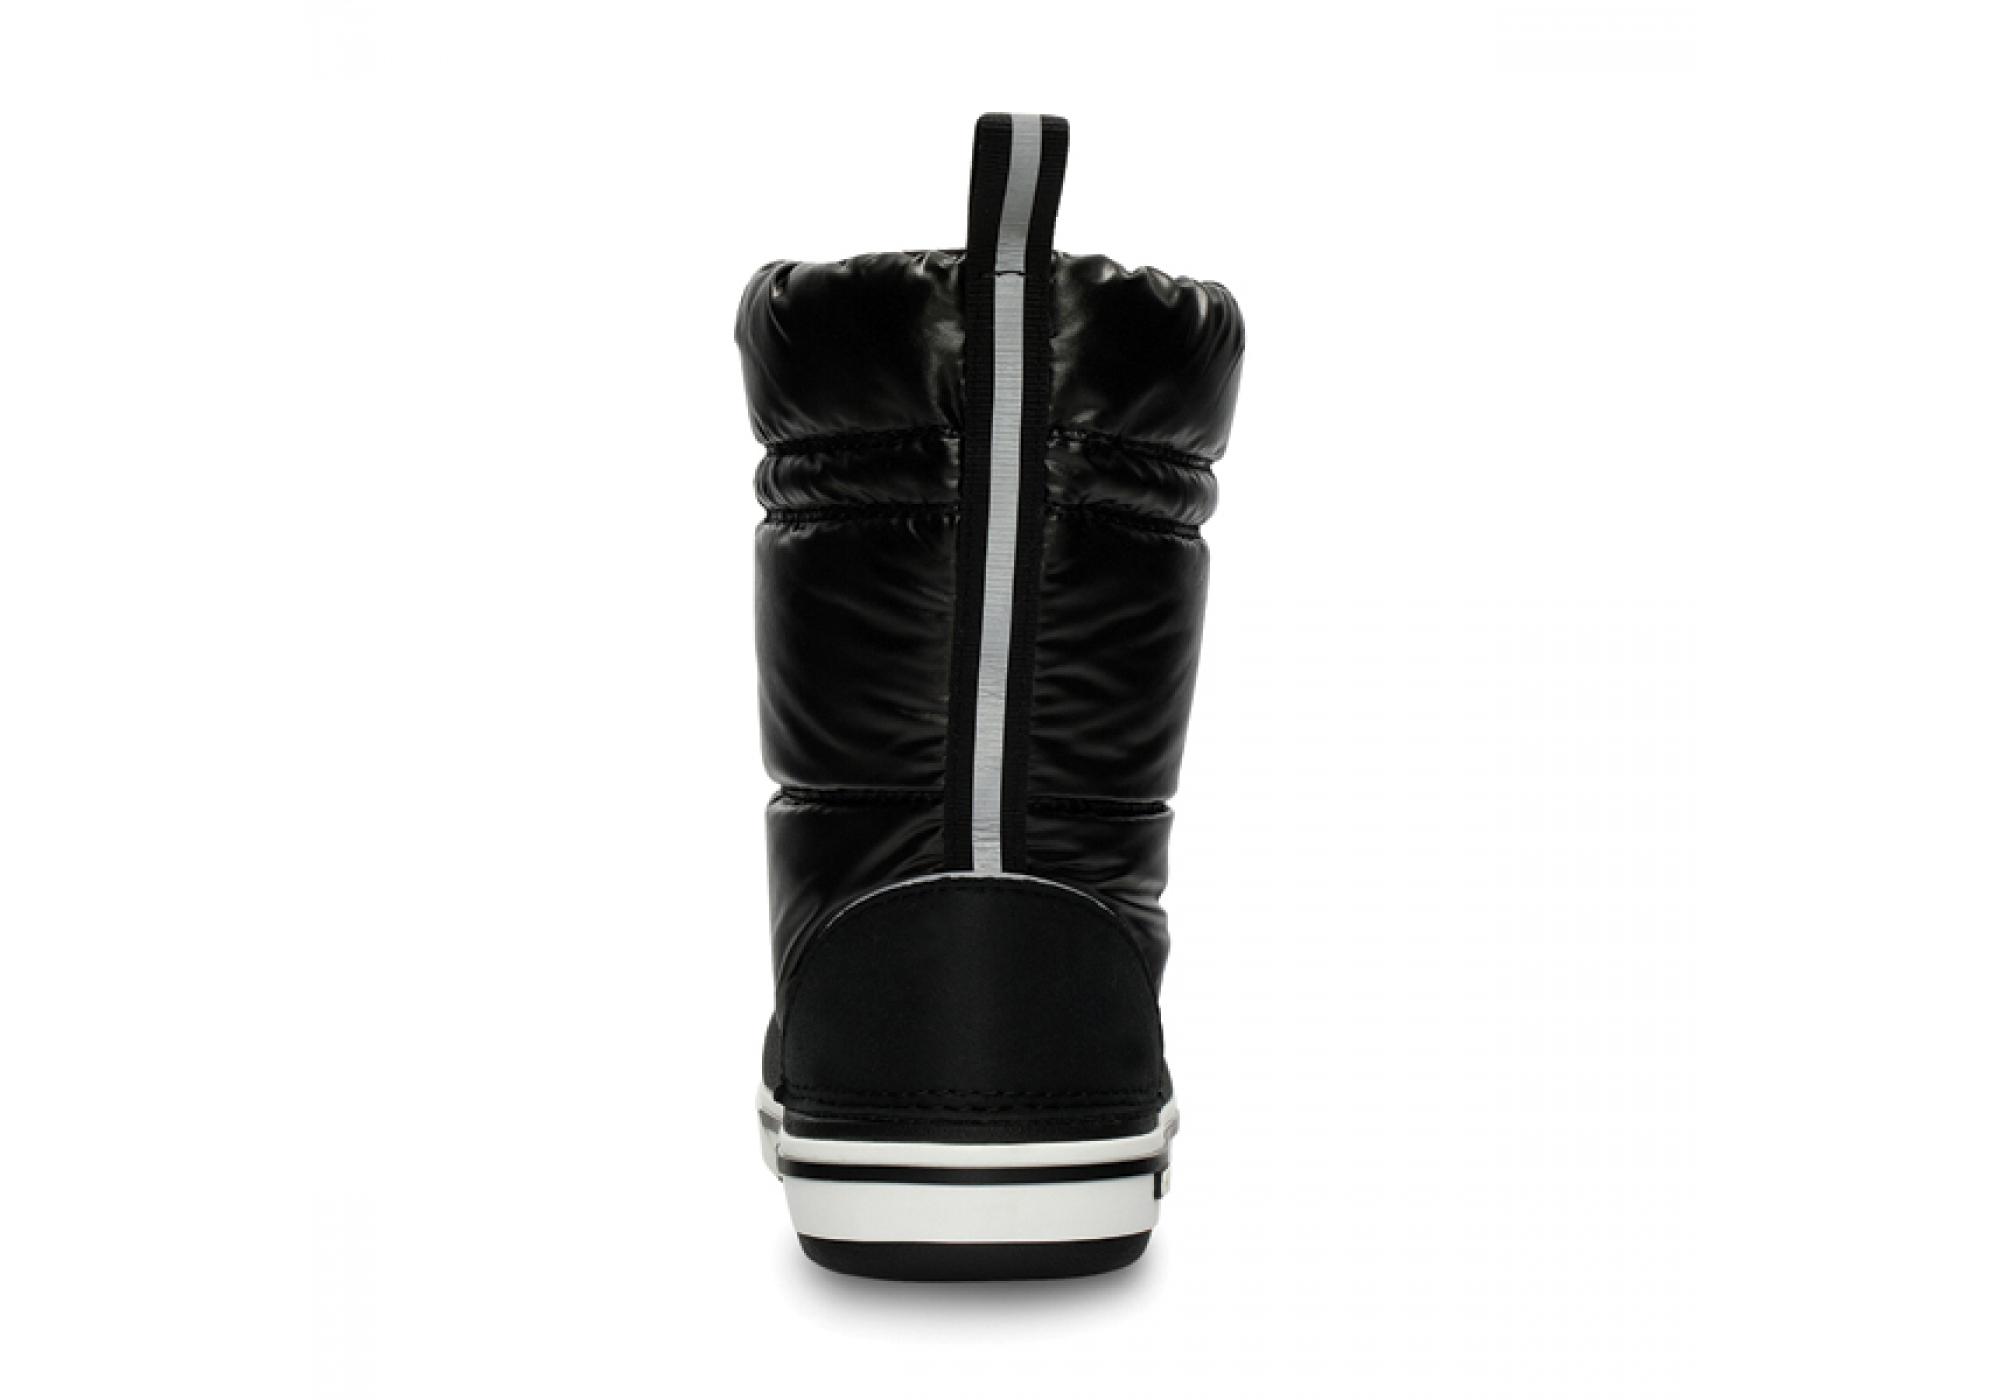 7f1a2b651 Crocband Iridescent Gust Boot Kids